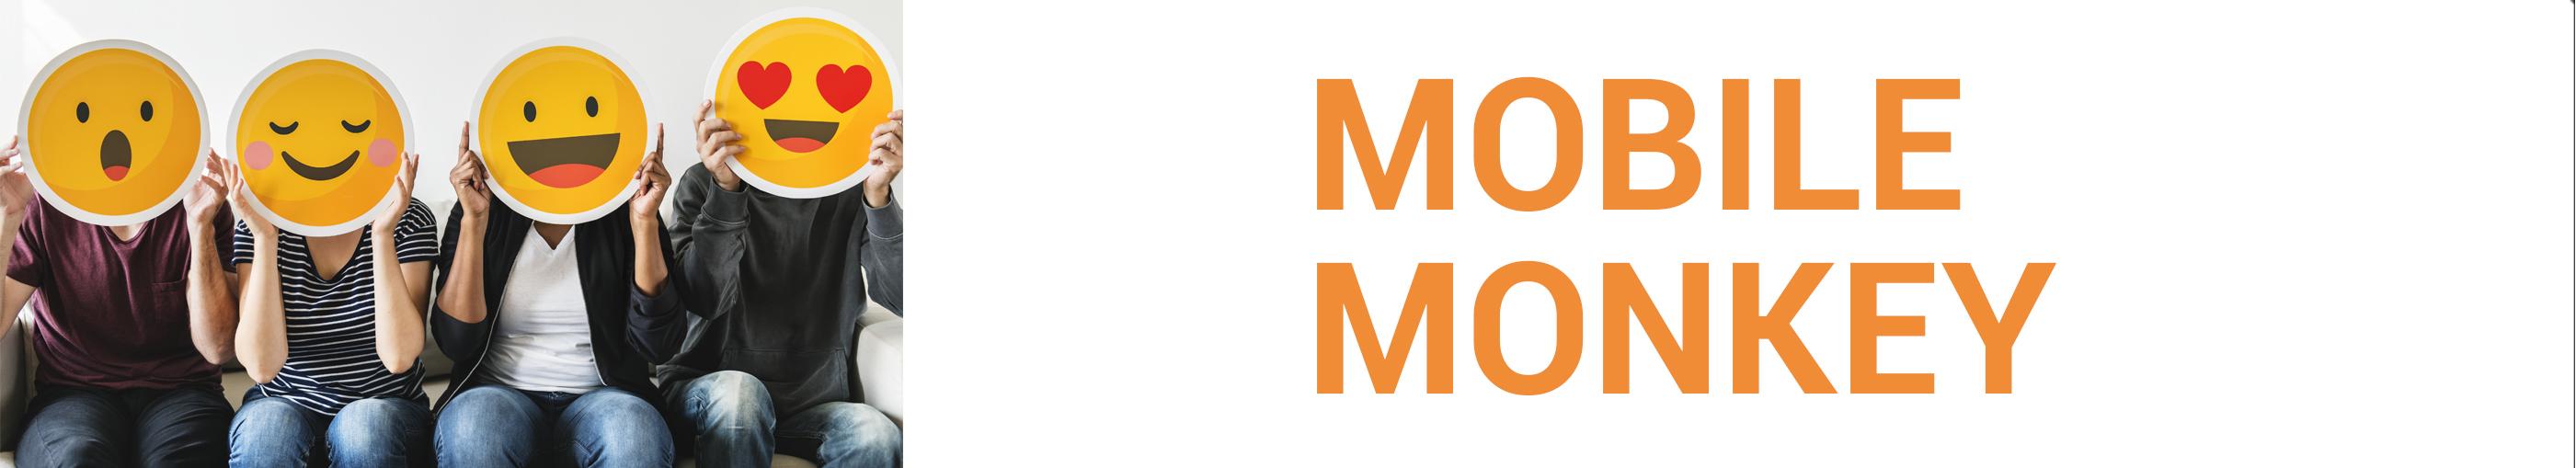 Mobile Monkey - STAAH Blog